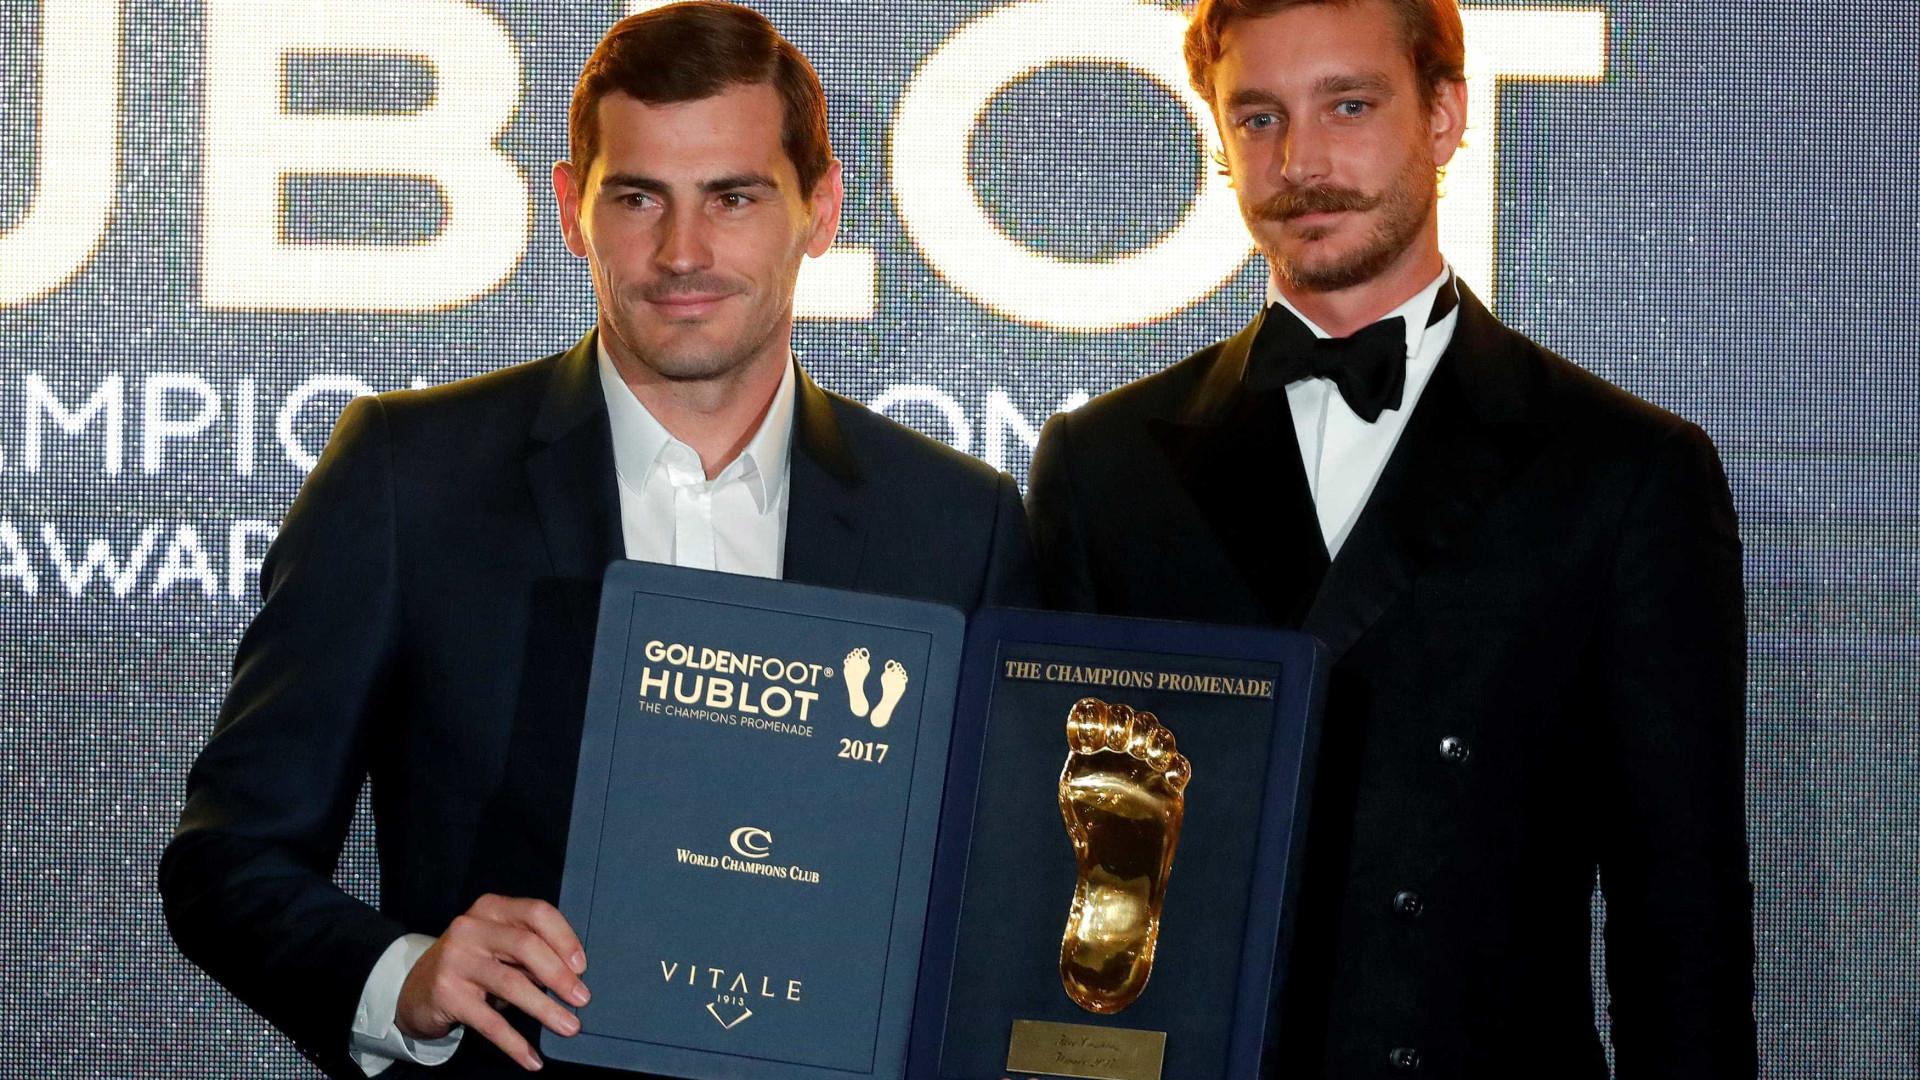 Pedro Proença elogia Iker Casillas pelo prémio Golden Foot